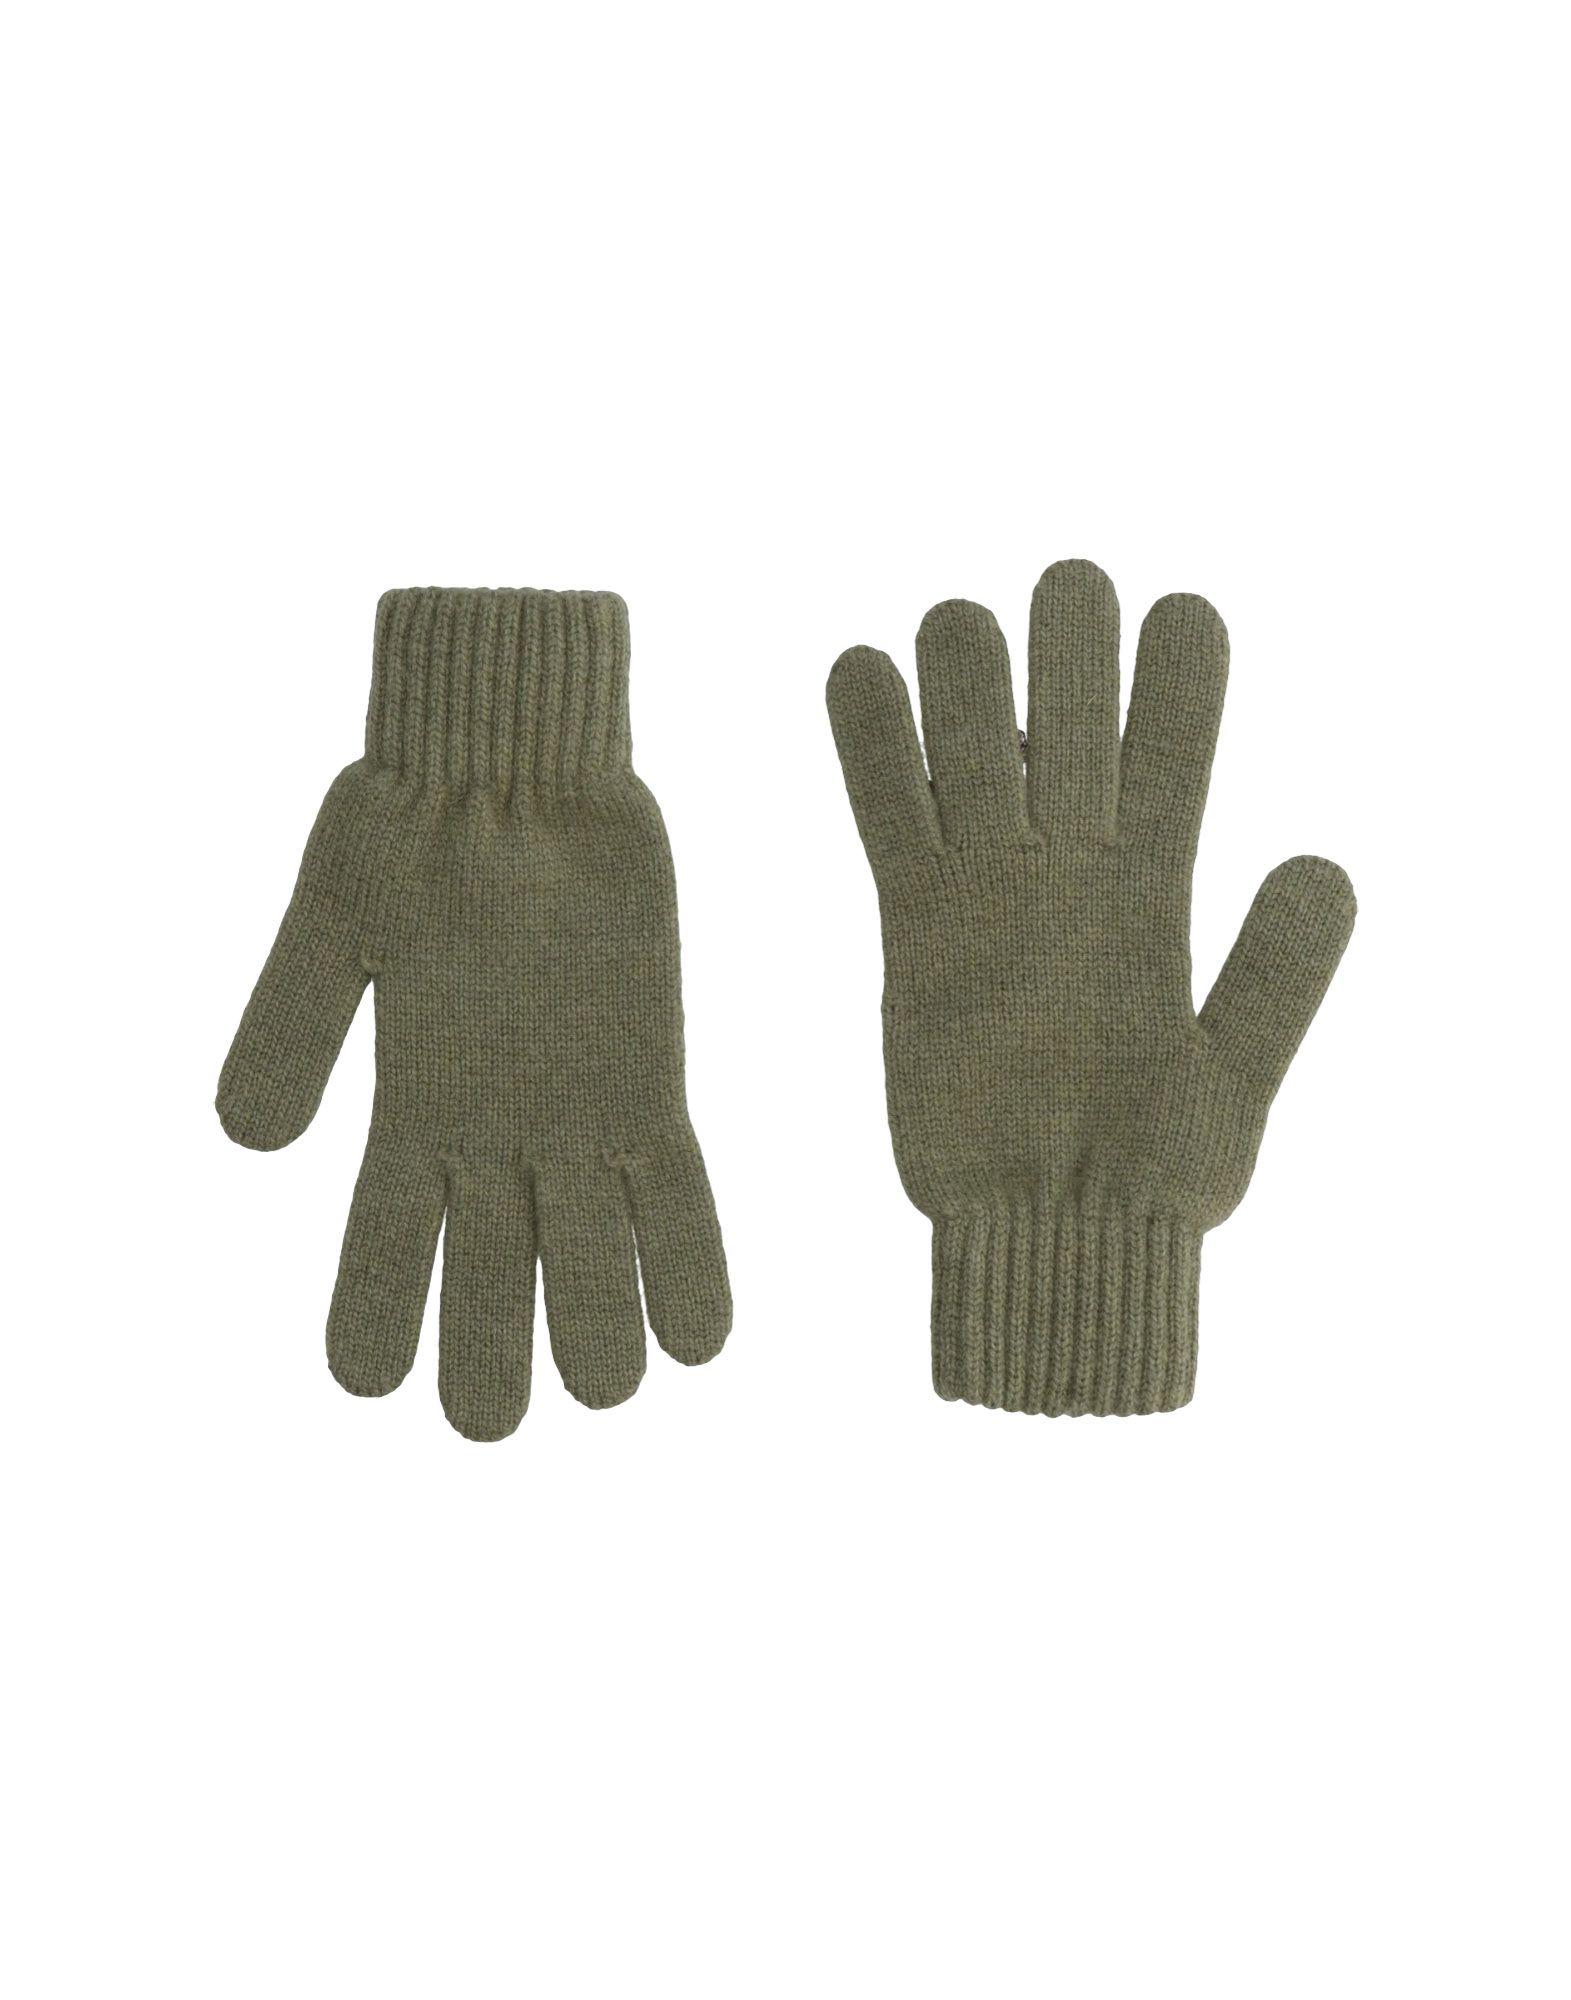 REGINA Gloves in Military Green